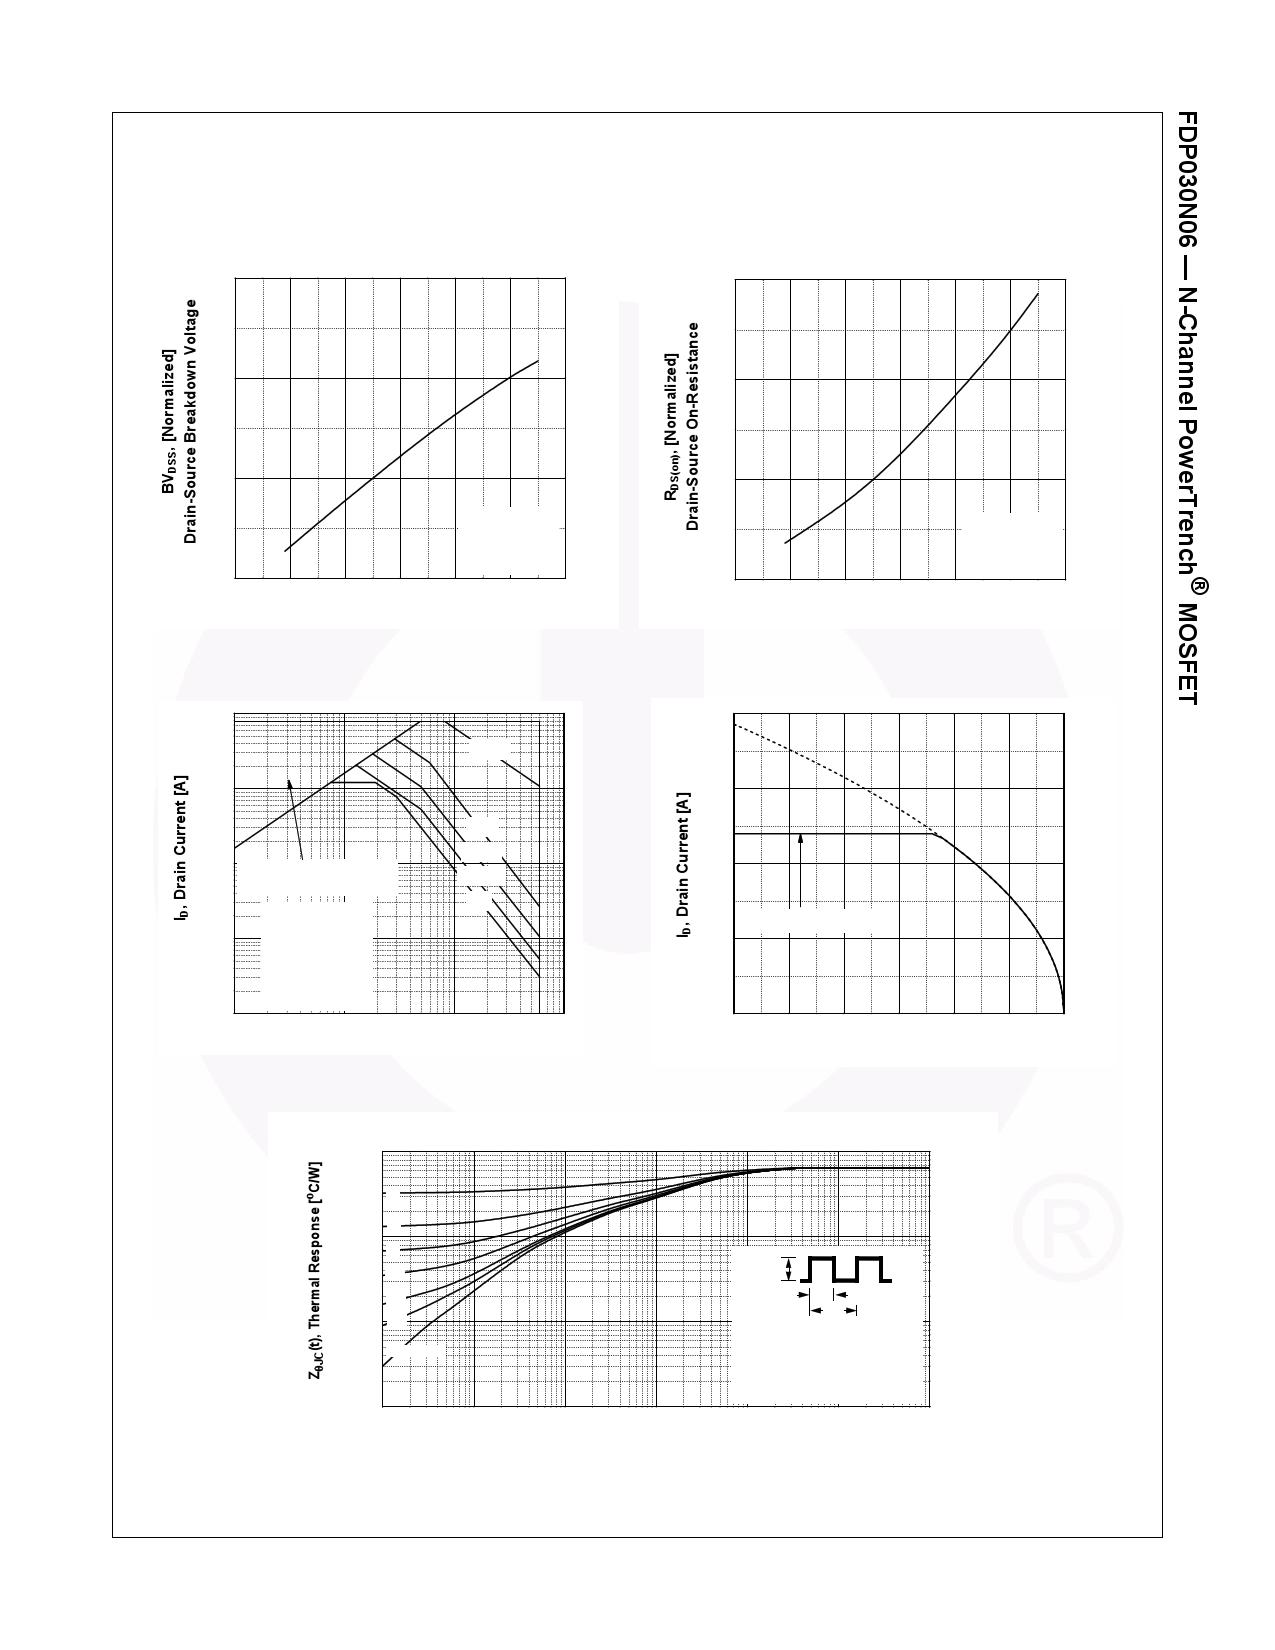 FDP030N06 pdf, 반도체, 판매, 대치품